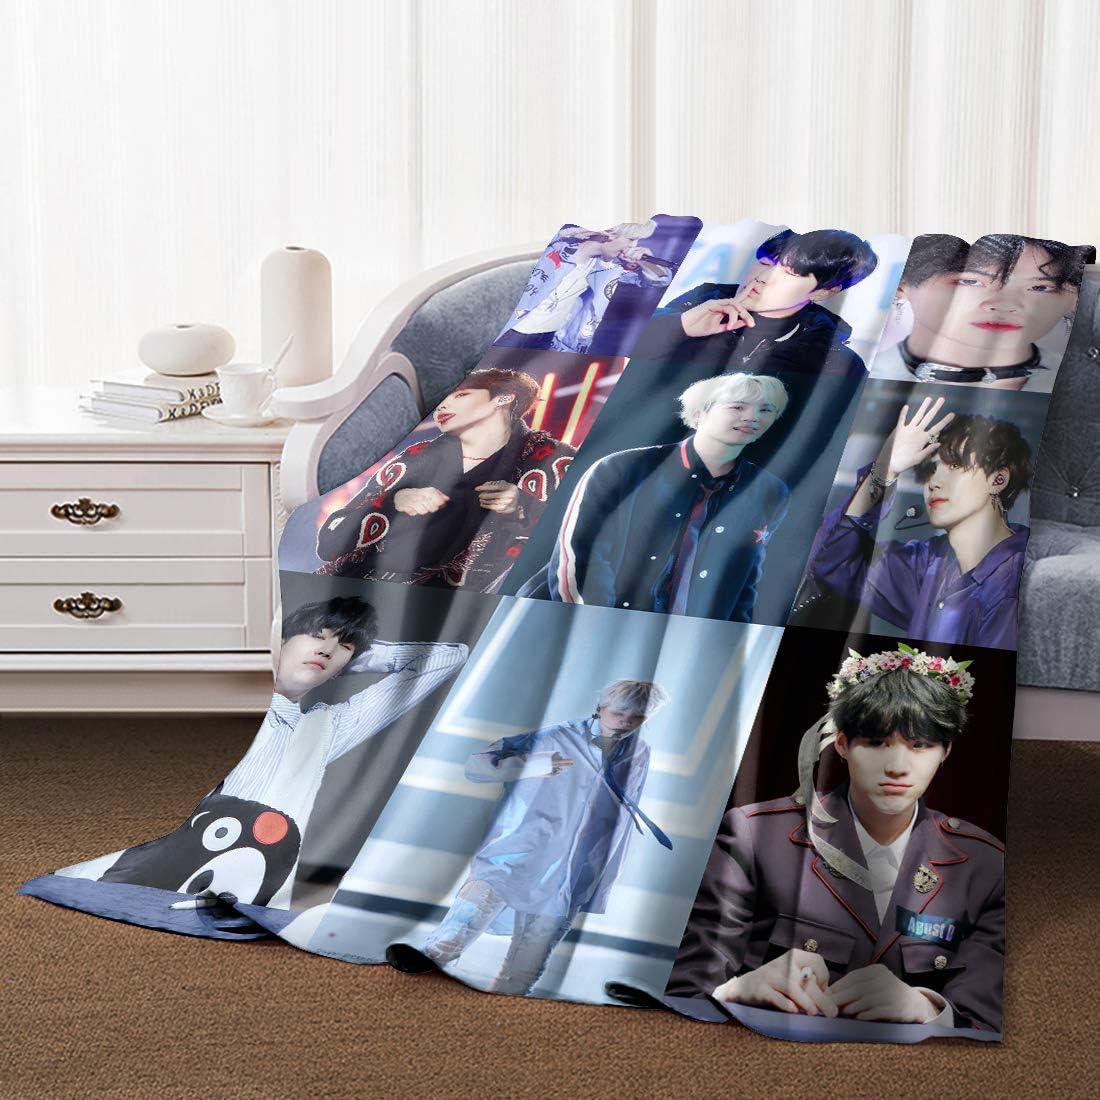 BTS Jin Flannel Blankets Ultra Soft Warm Cabin Living Room//Bedroom Warm Blanket 40x59